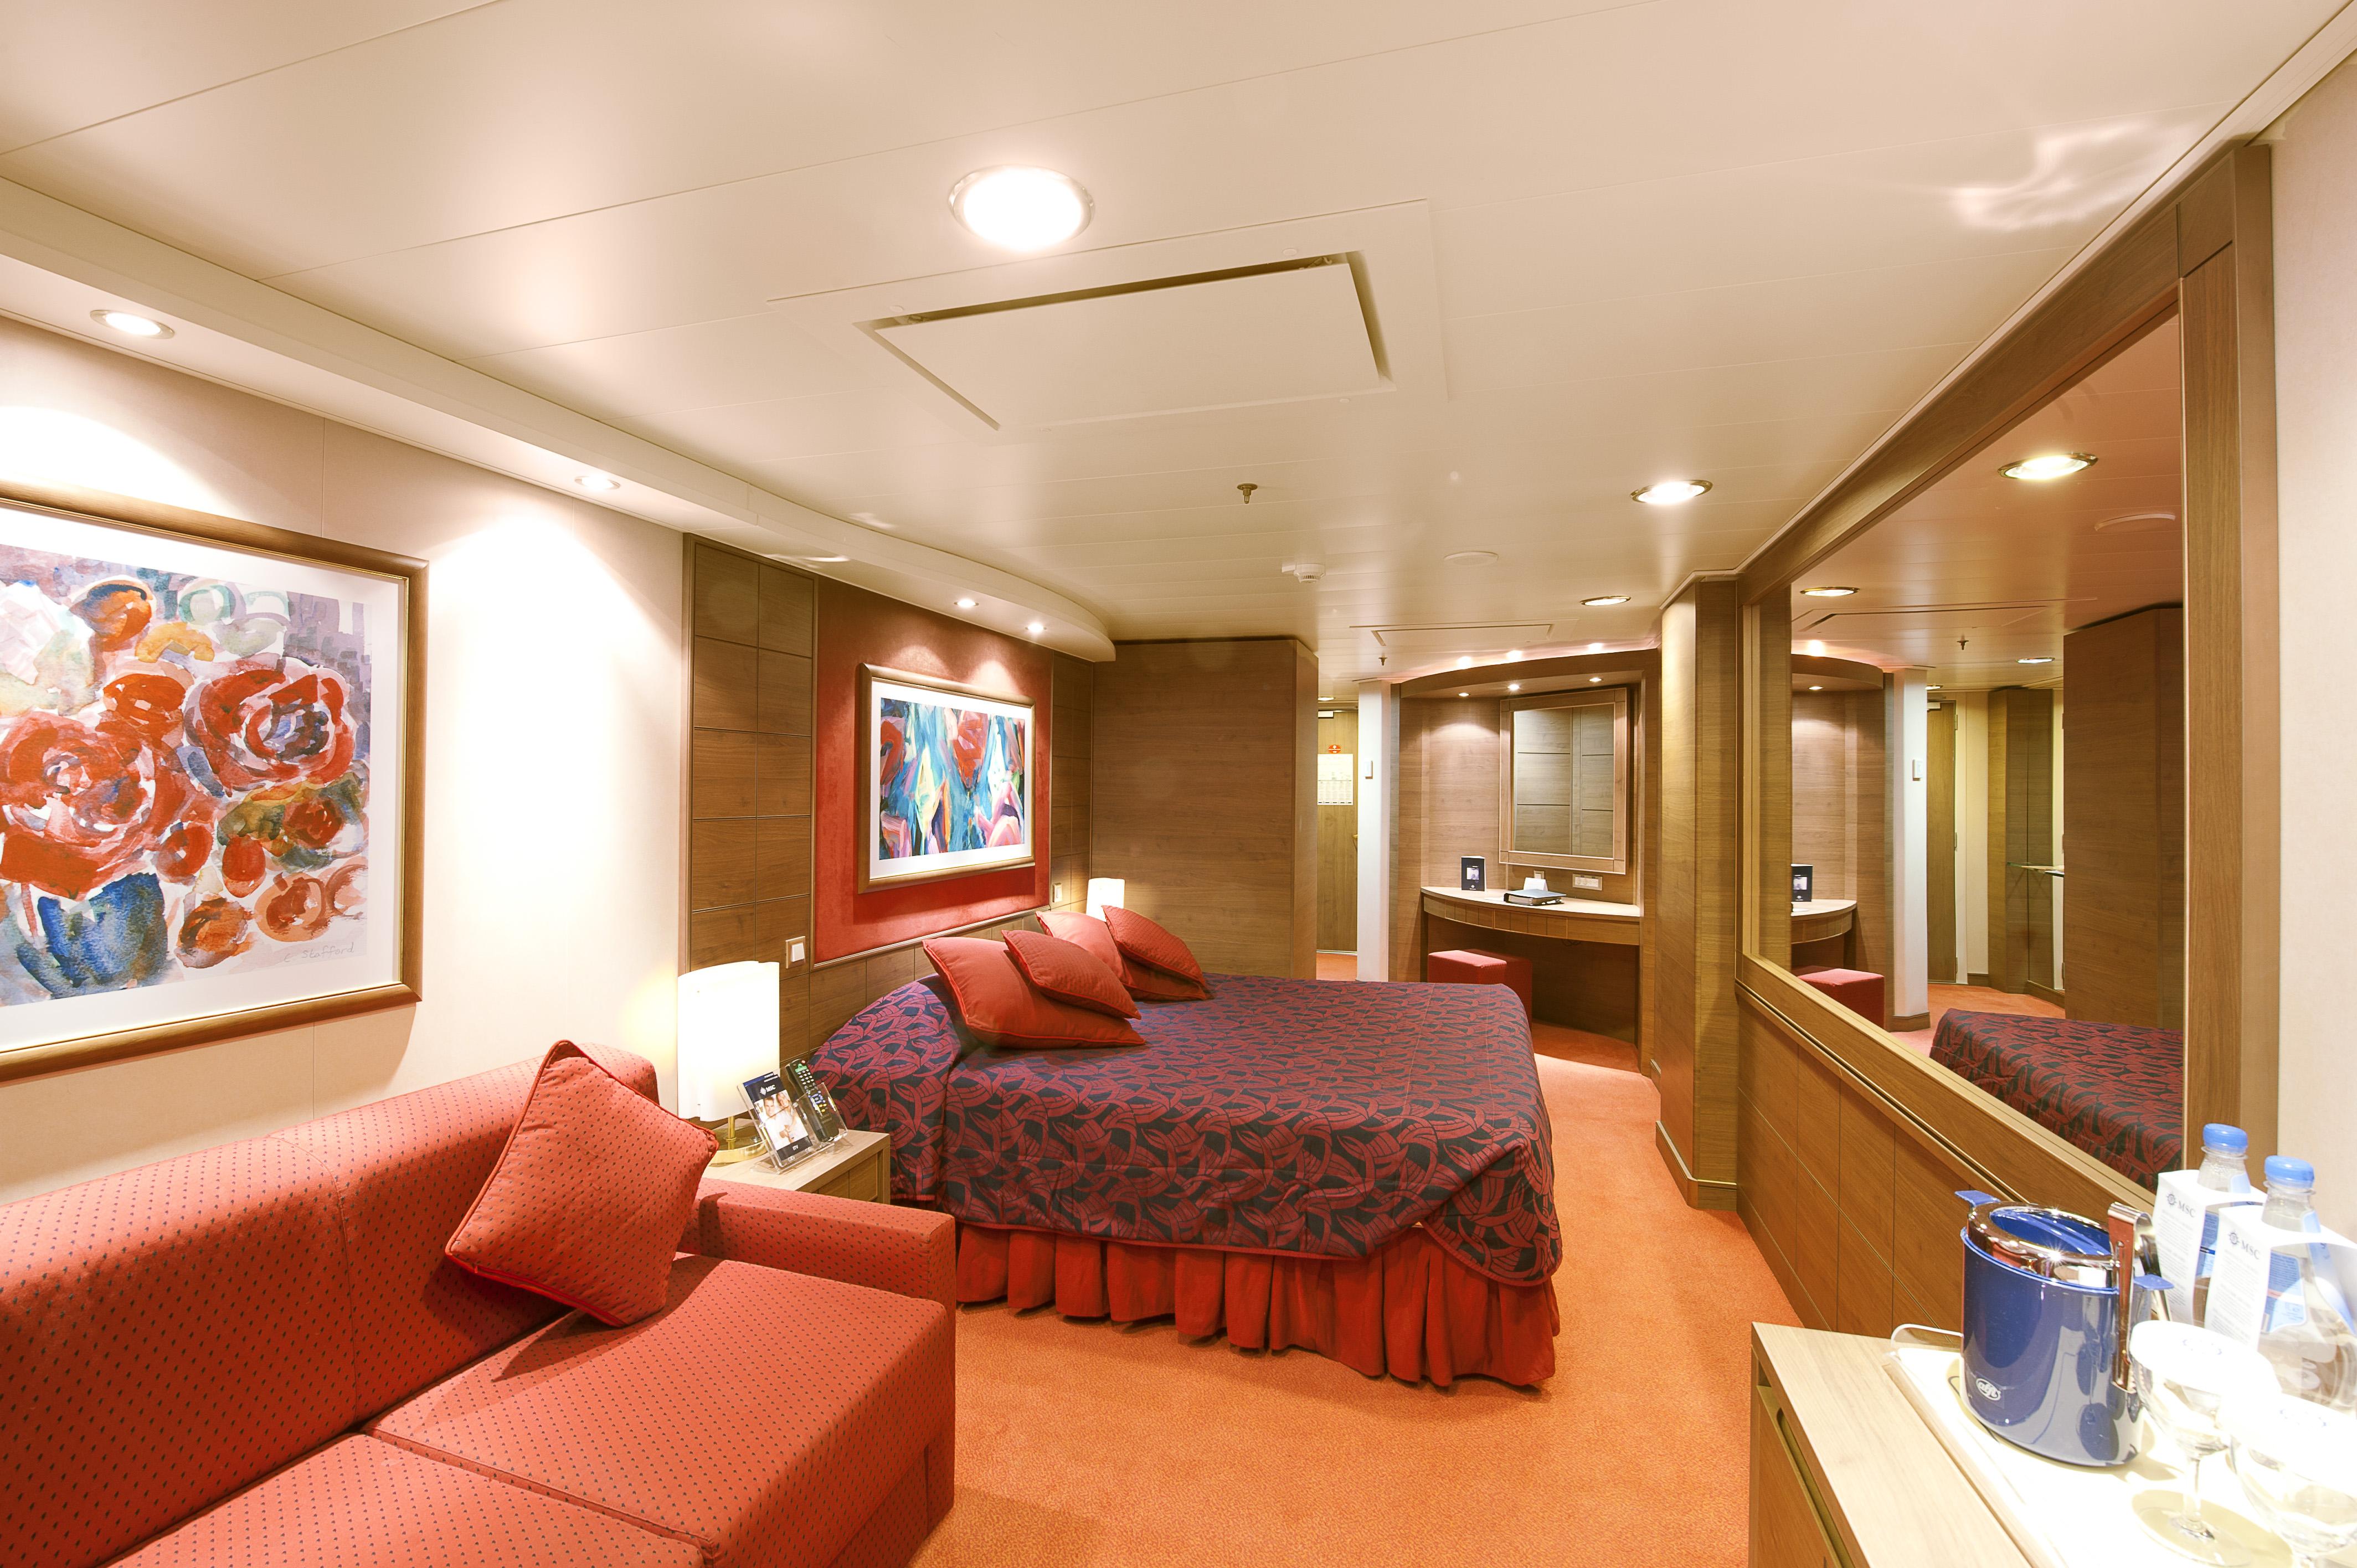 MSC Musica Class balcony cabin 3.jpg